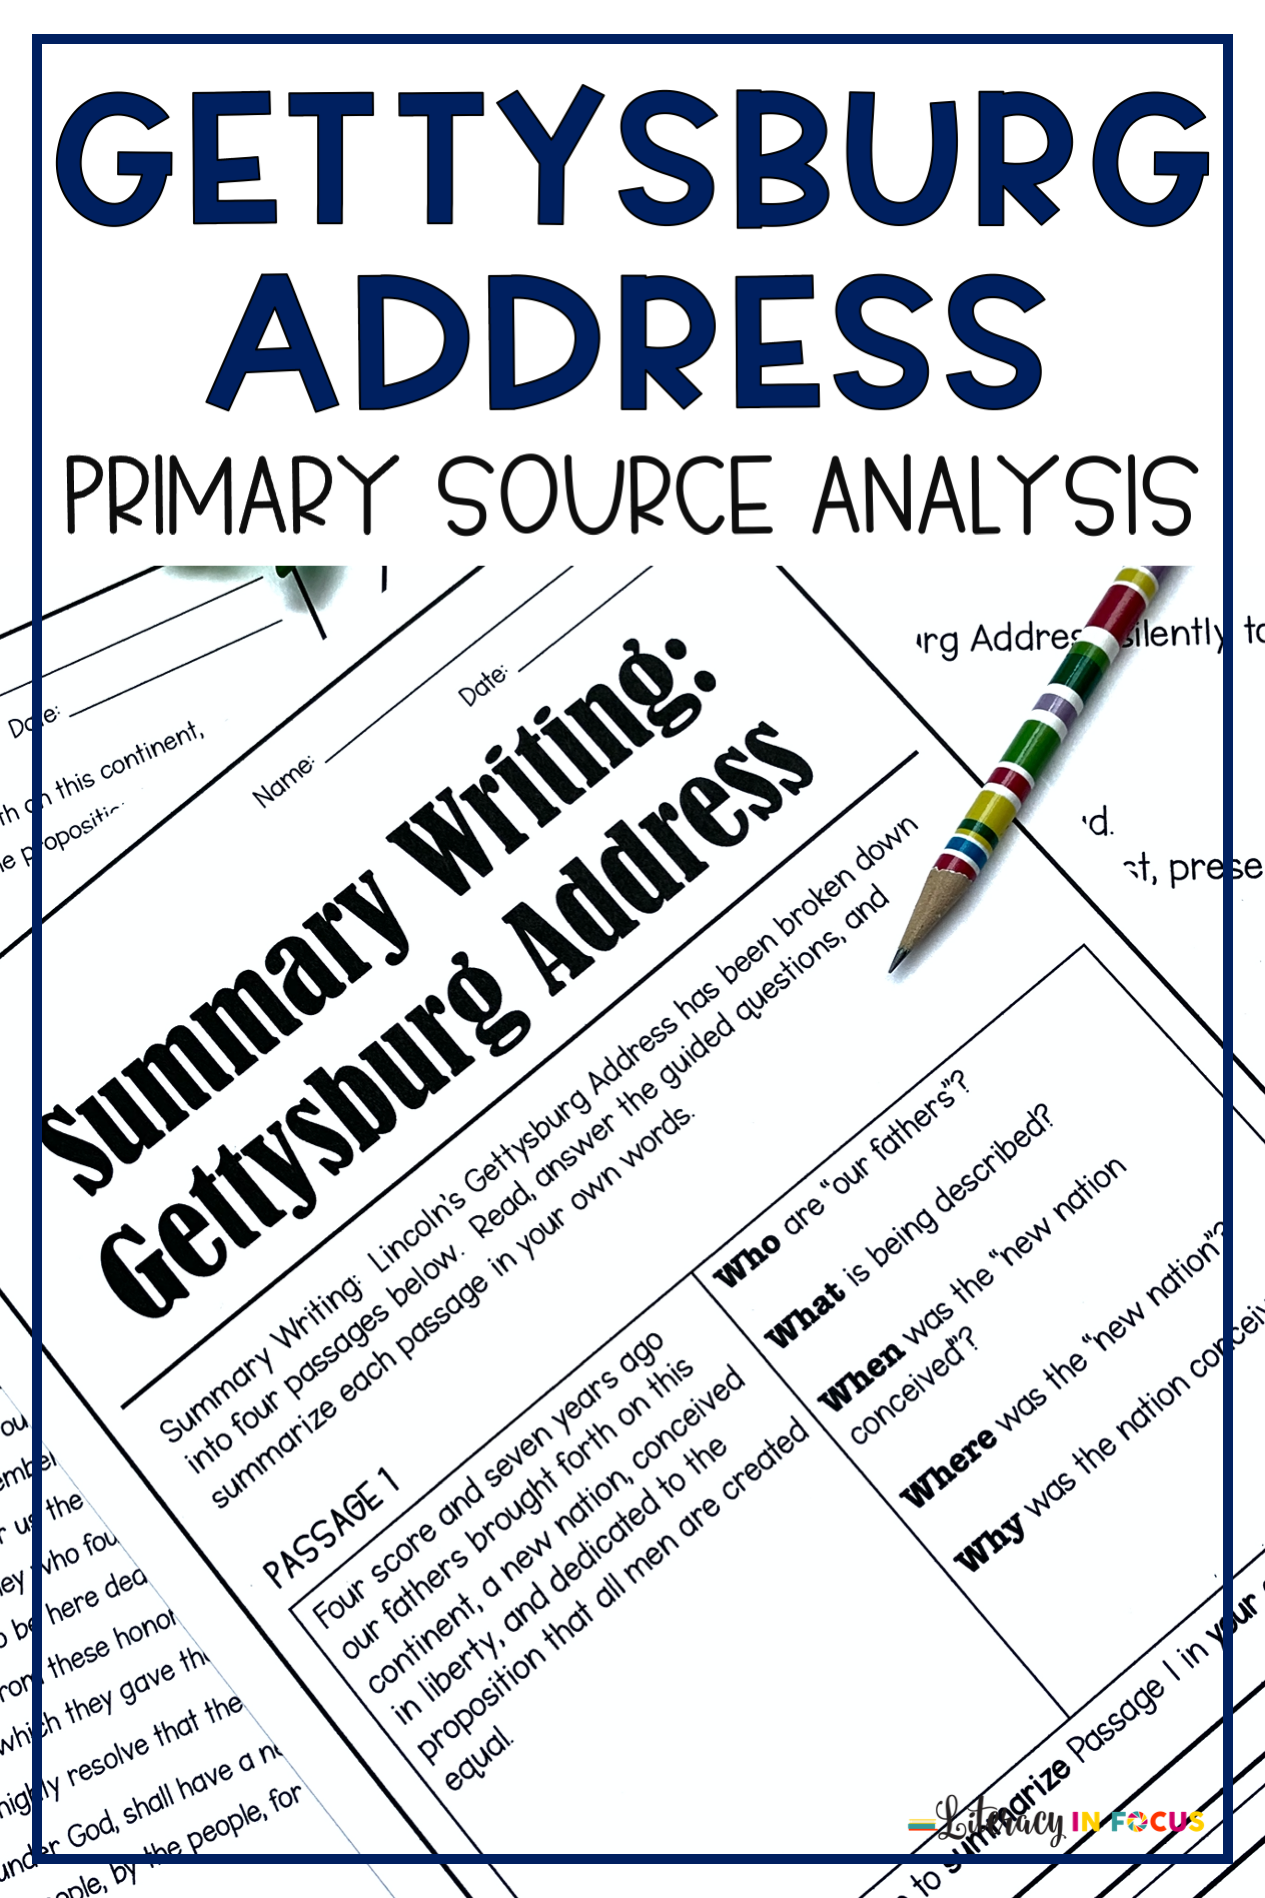 Gettysburg Address Printable And Digital Activities For